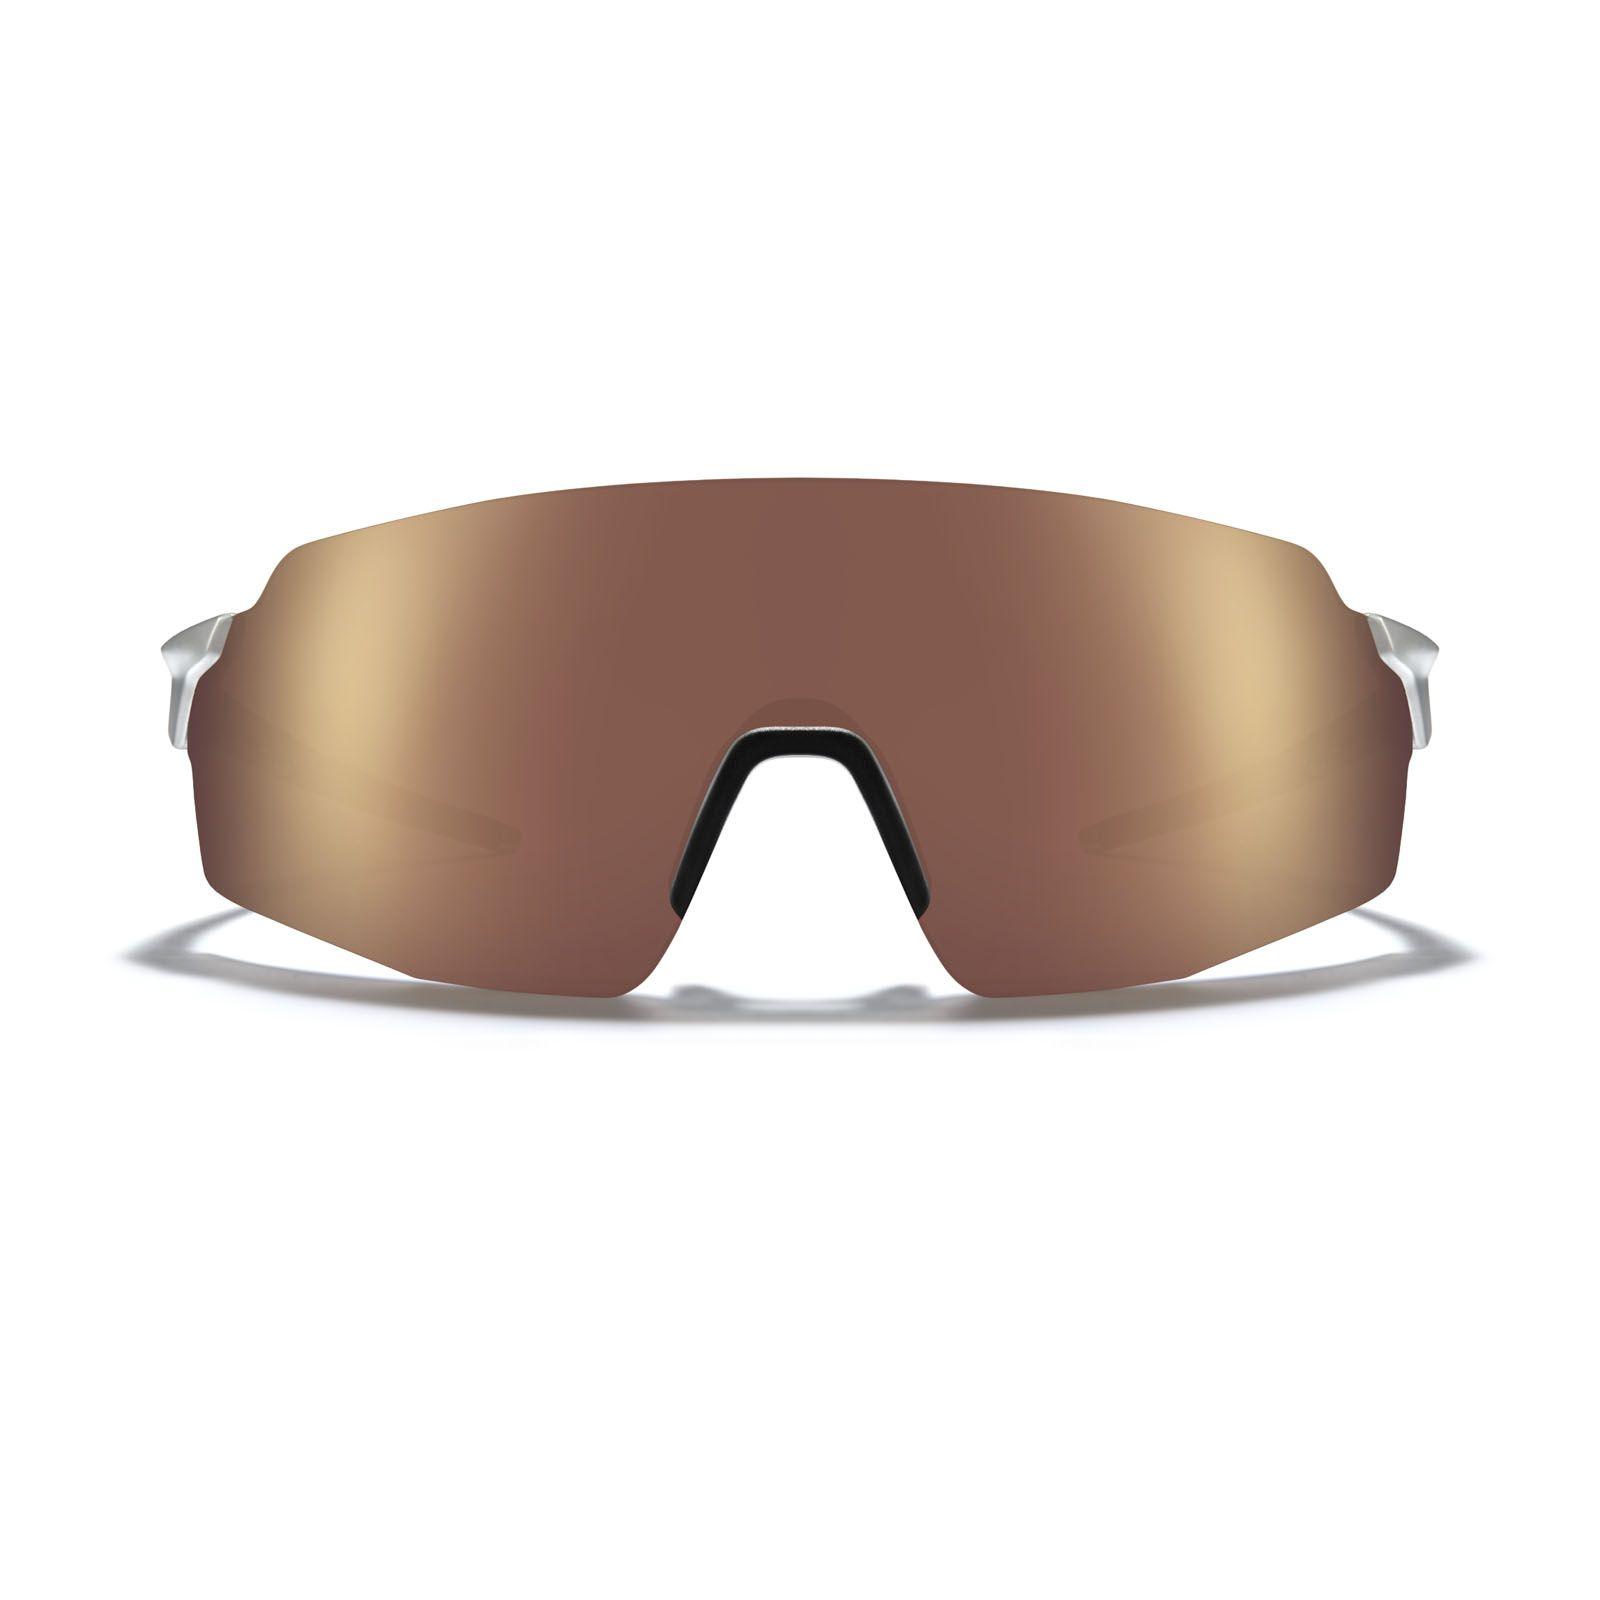 aca6b4e6bd1 SL-1 and SL-1x Series - Oversized Rimless Sunglasses